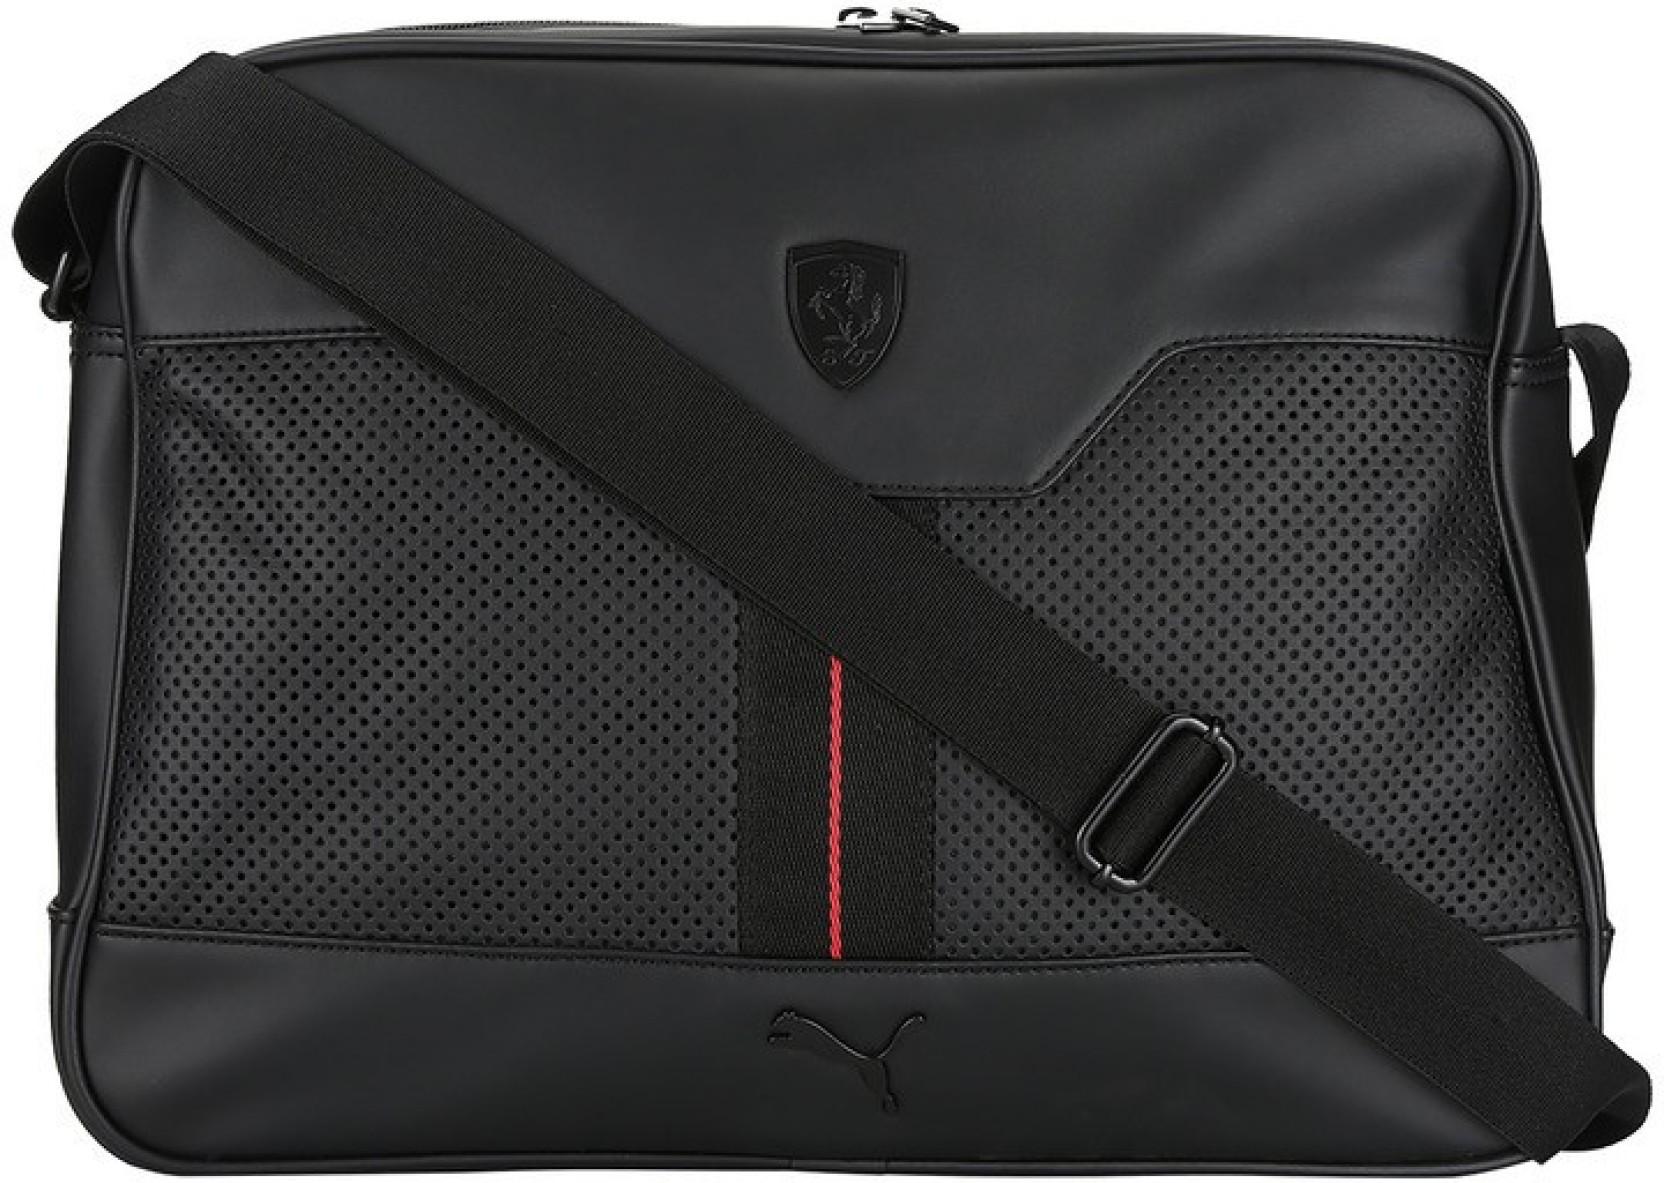 c833ada7cba0 Buy Puma Sling Bag Black Online   Best Price in India